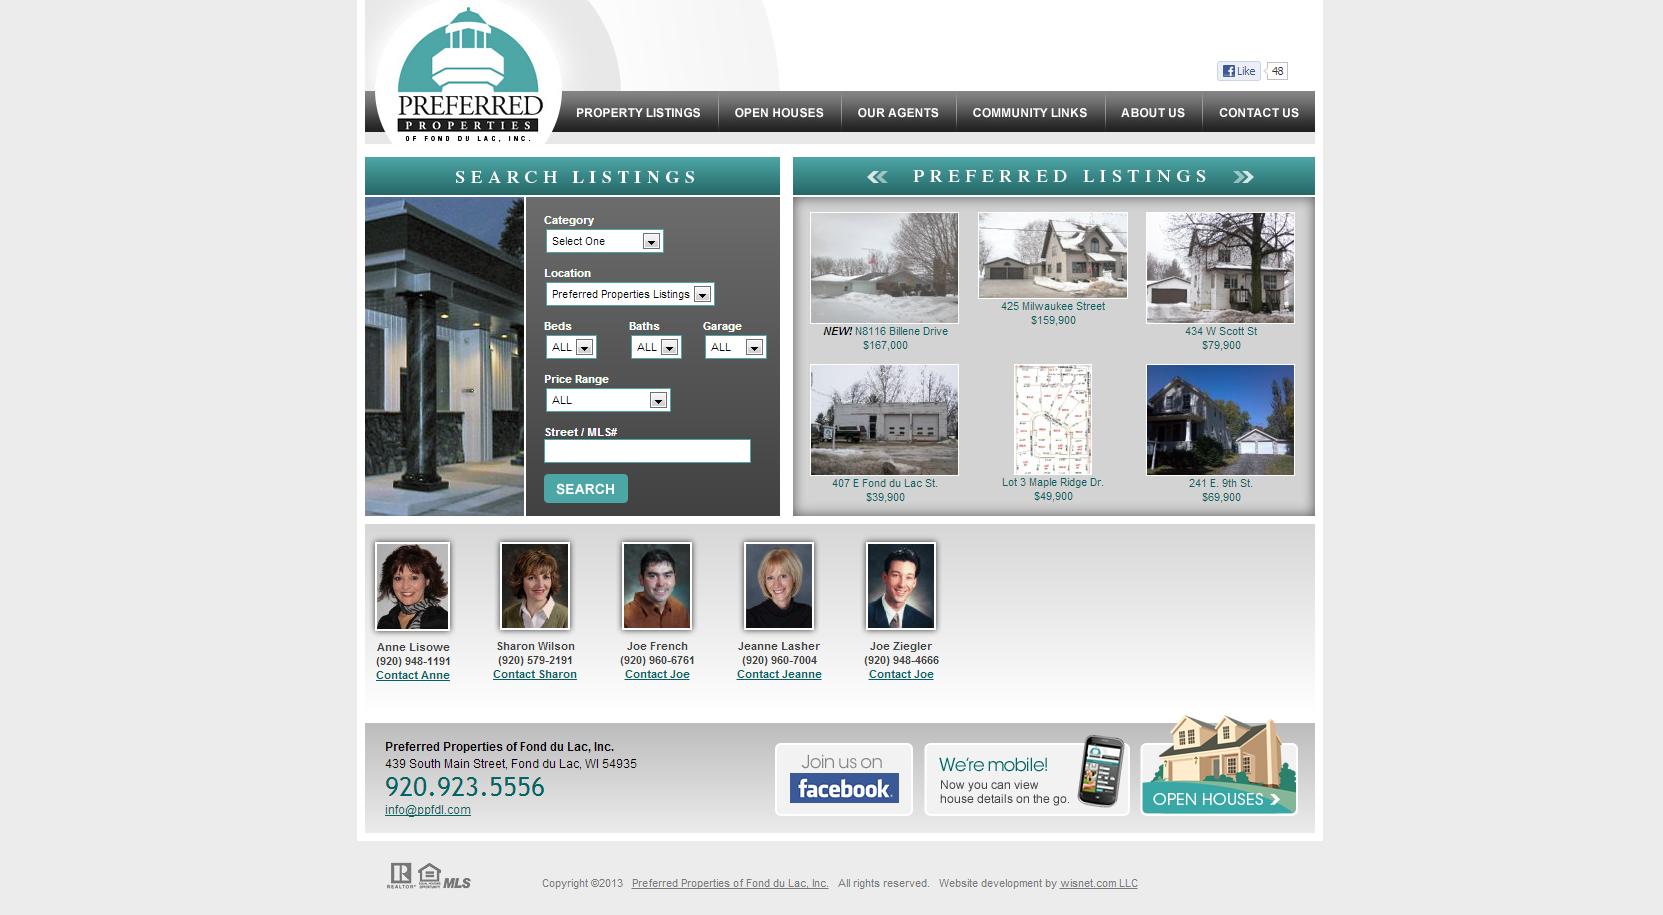 Preferred Properties of Fond du Lac, Inc. | Portfolio | Pinterest